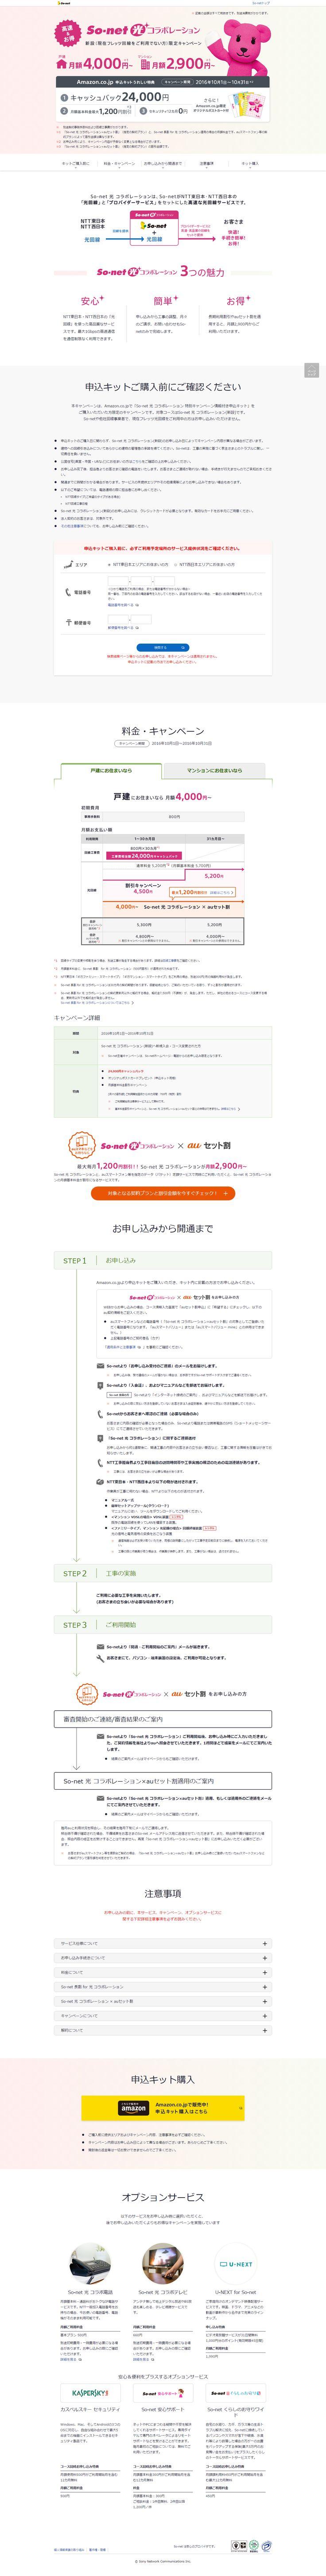 Amazon.co.jp 新設限定キャンペーン  | So-net 光 コラボレーション | So-net